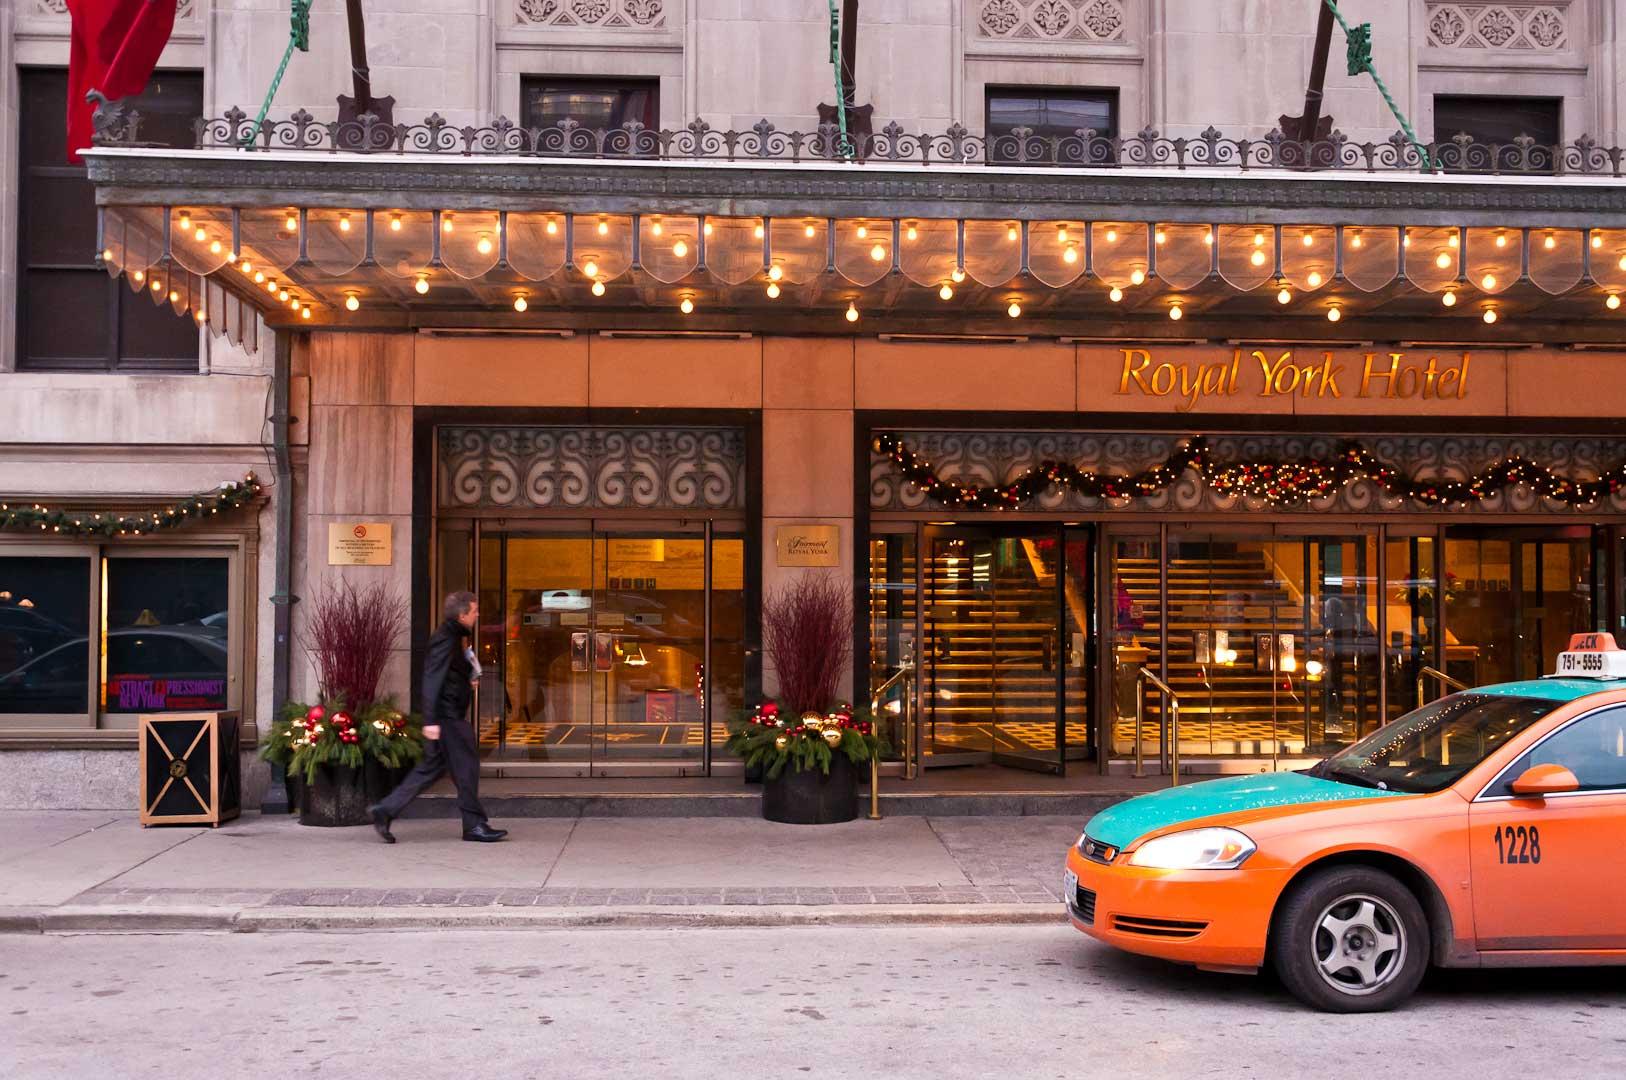 Royal York Hotel Lobby Door Maintenance by Explore1.ca